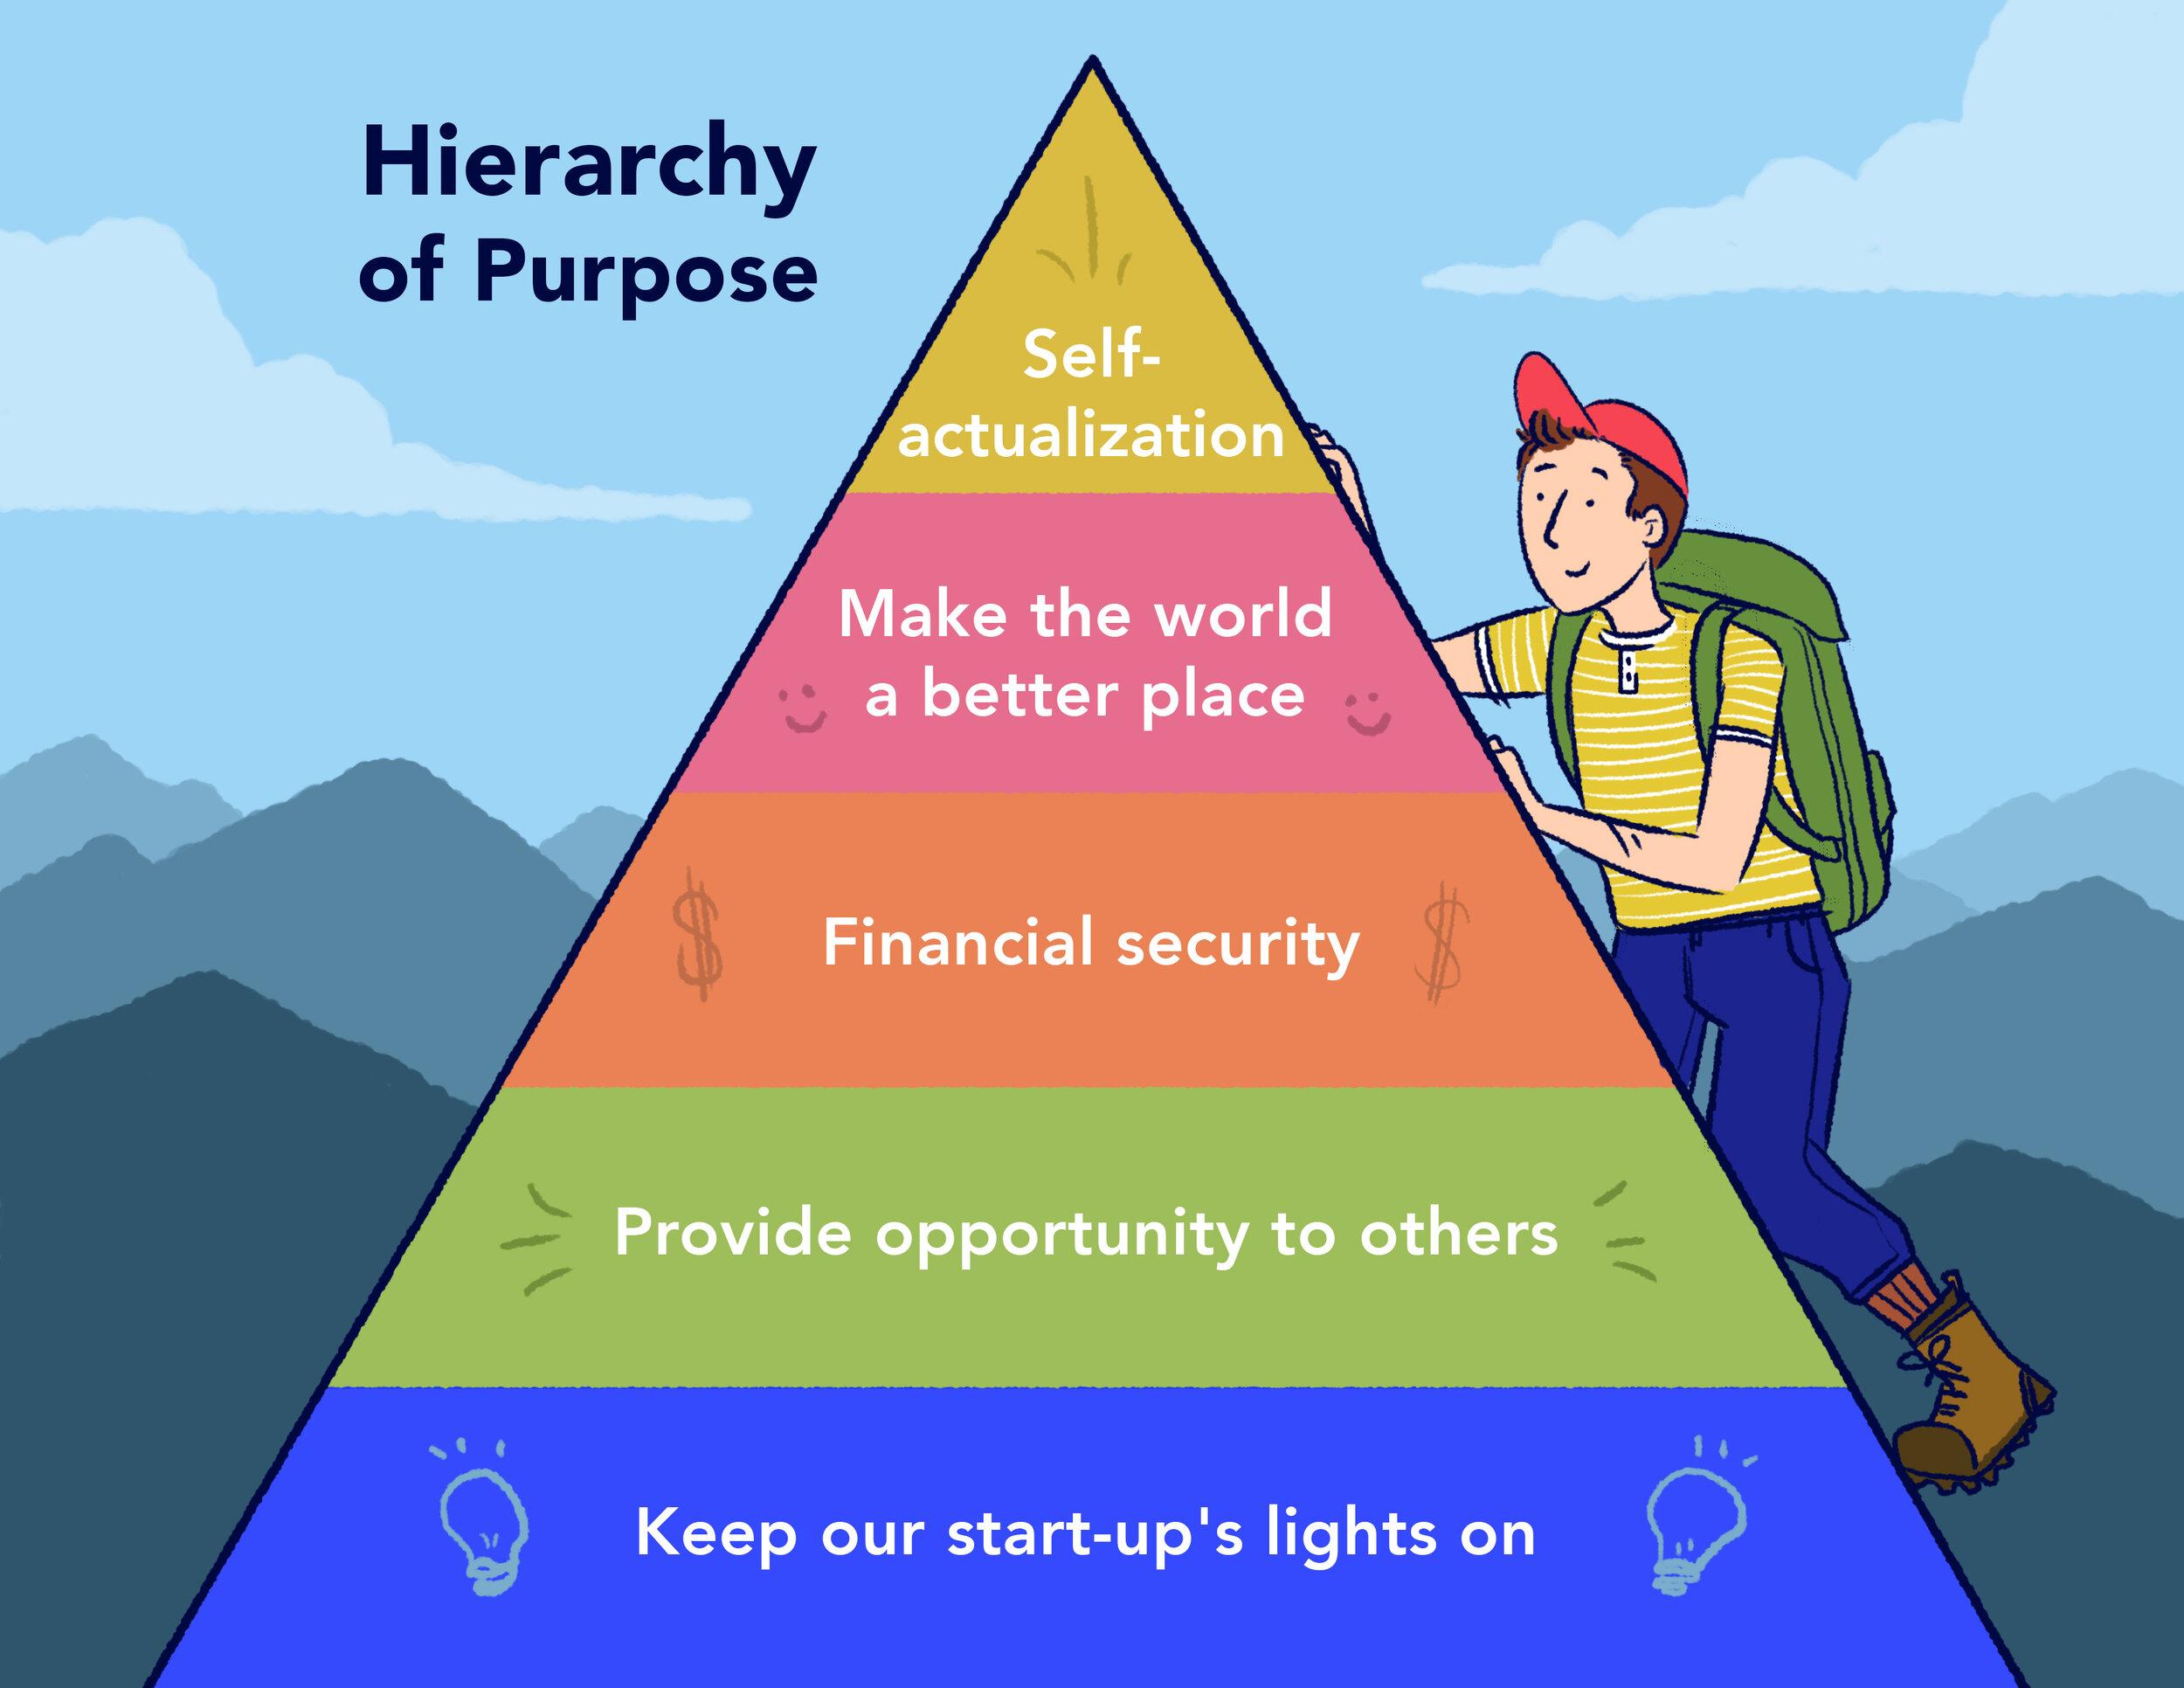 HierarchyofPurpose.jpg